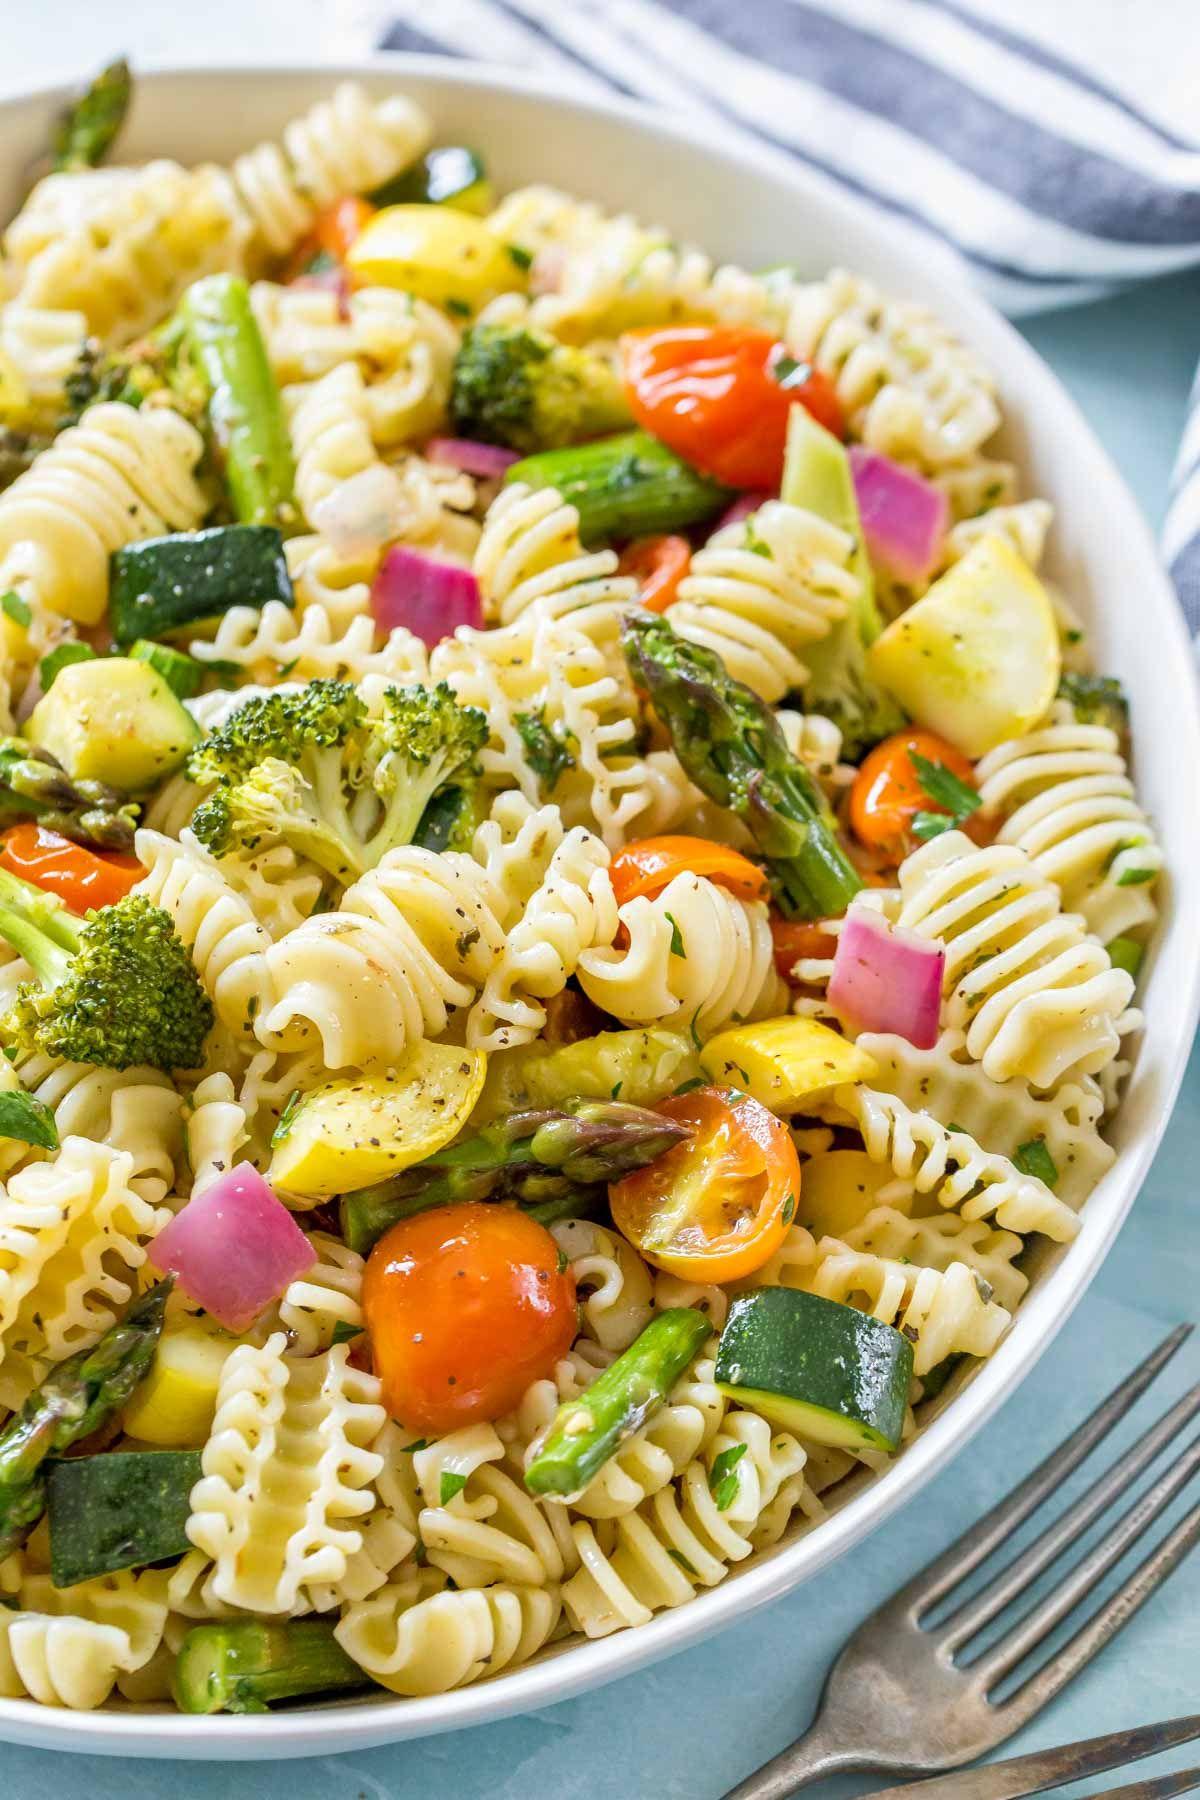 Roasted Vegetable Pasta Salad Dairy Free Vegan Simply Whisked Recipe Vegetable Pasta Salads Roasted Vegetable Pasta Vegan Pasta Salad